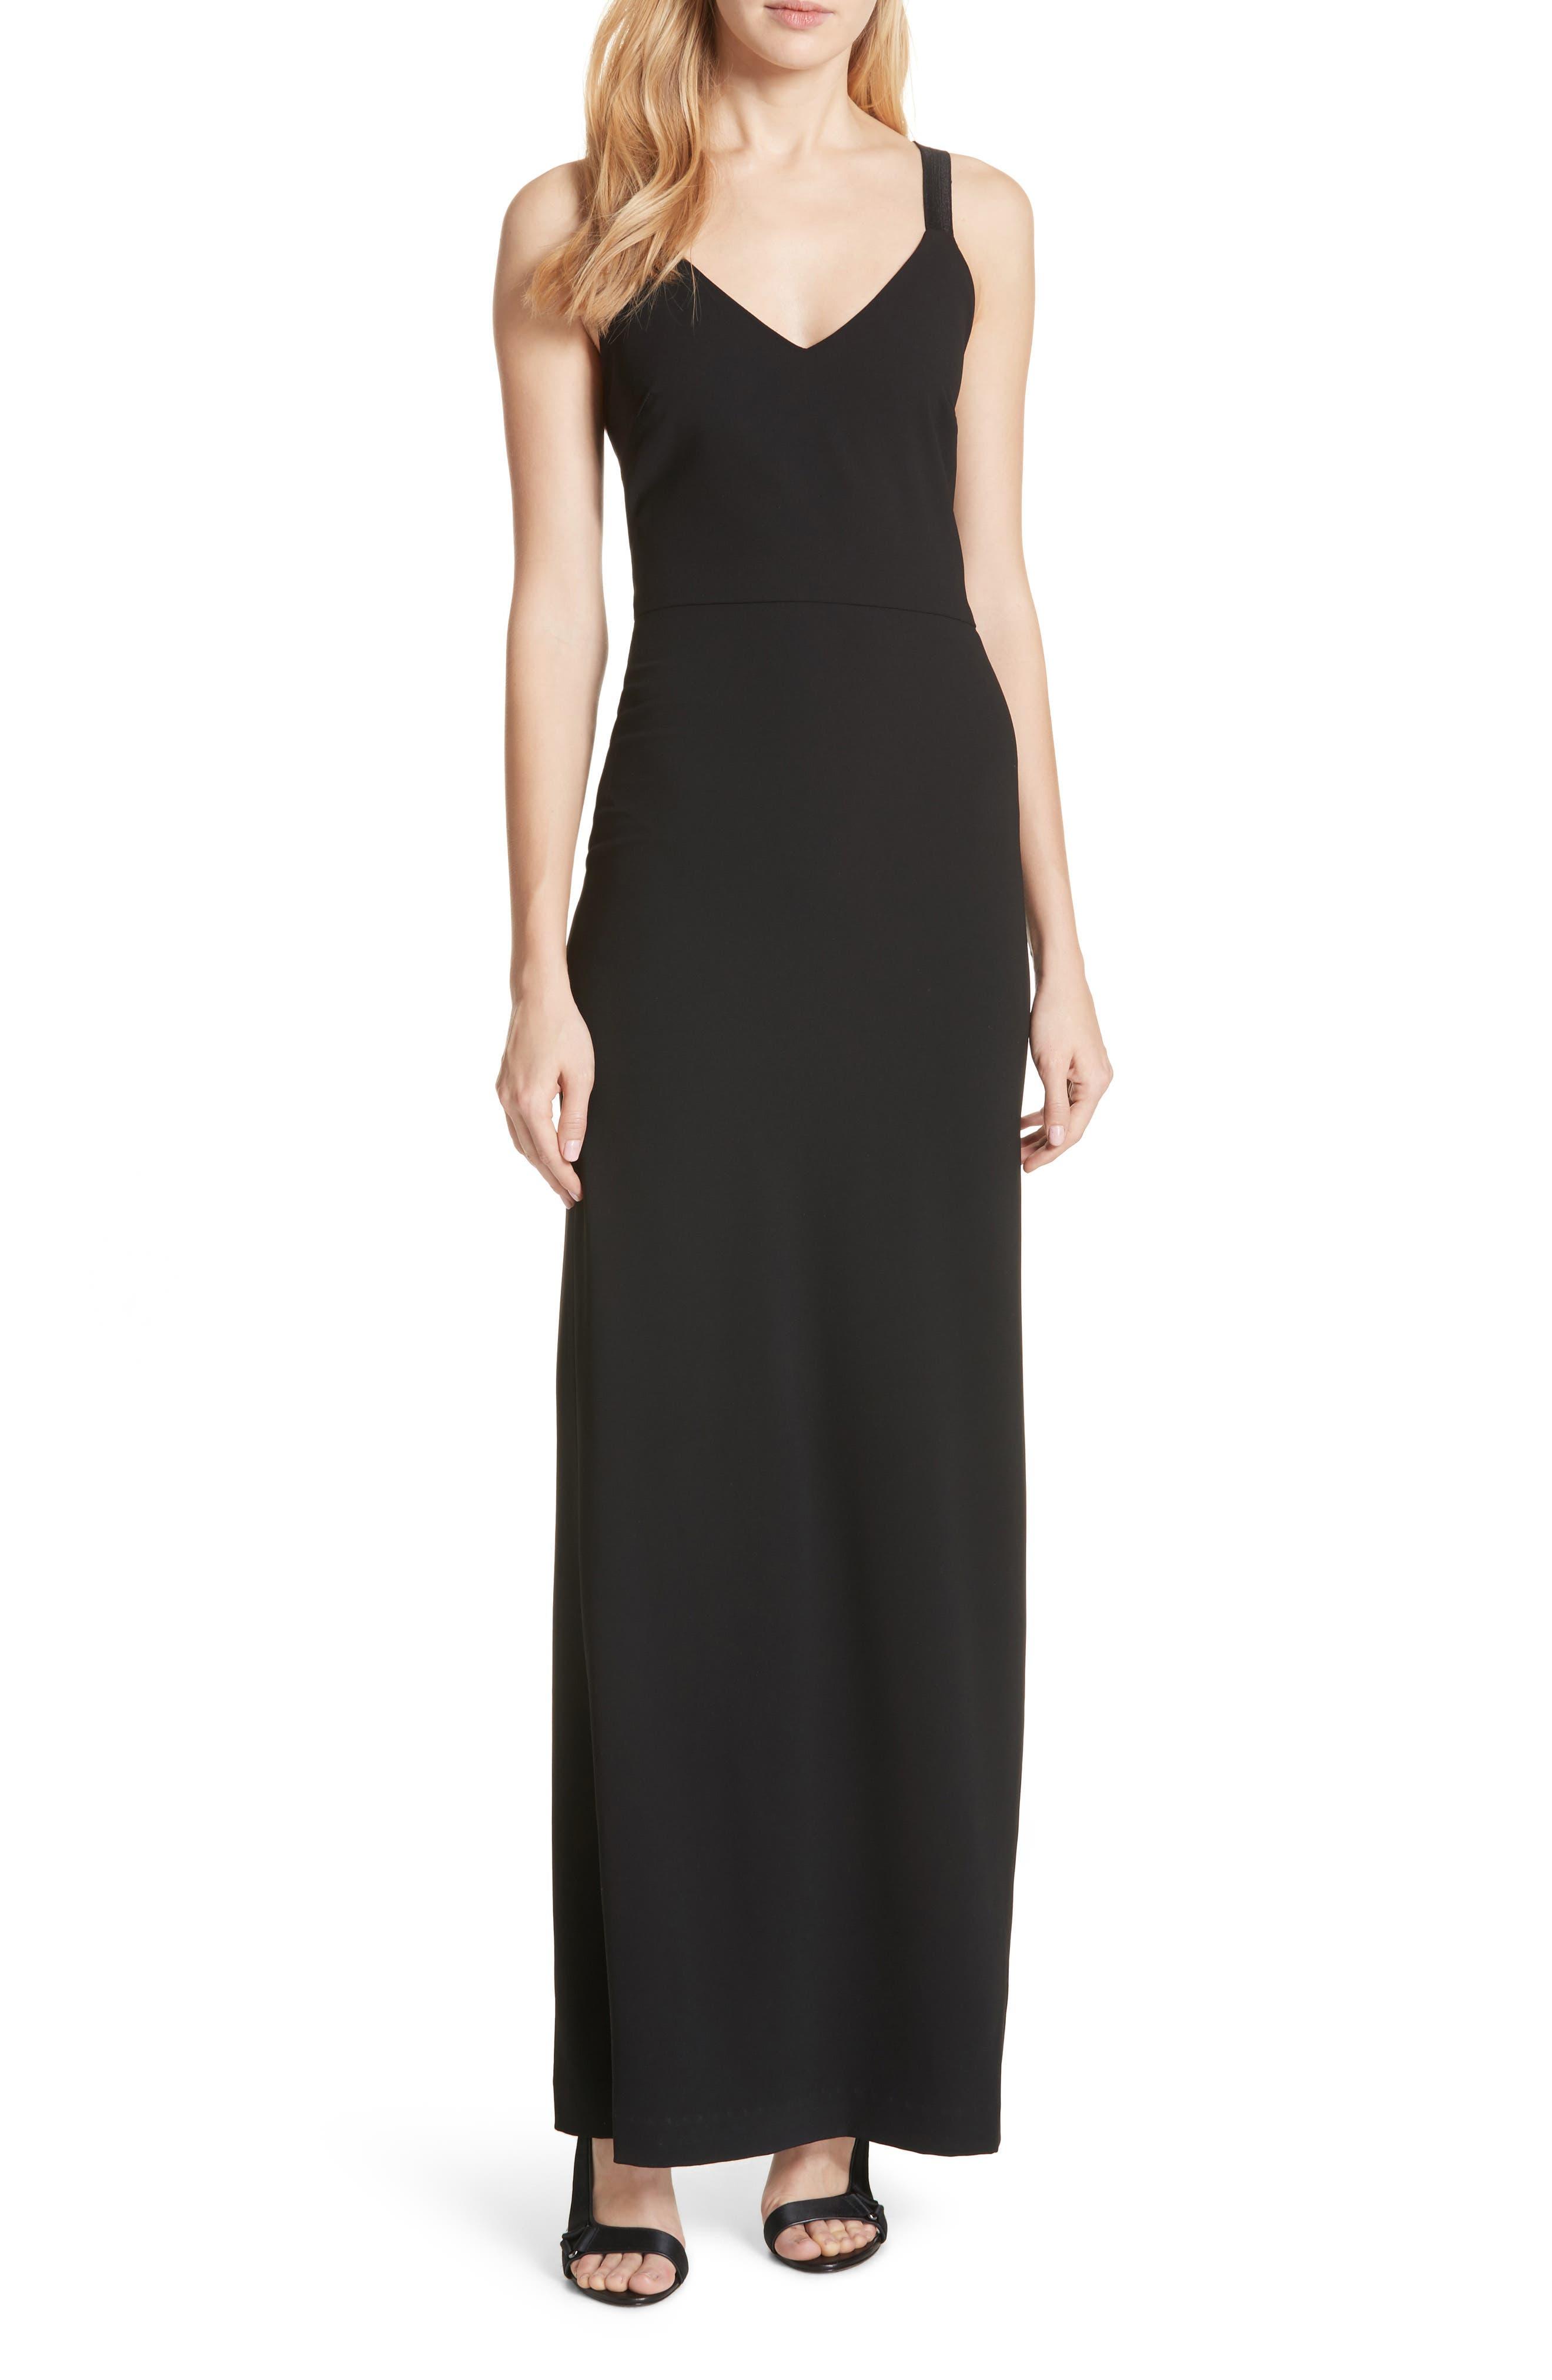 Brianna Strappy Back Maxi Dress,                             Main thumbnail 1, color,                             Black